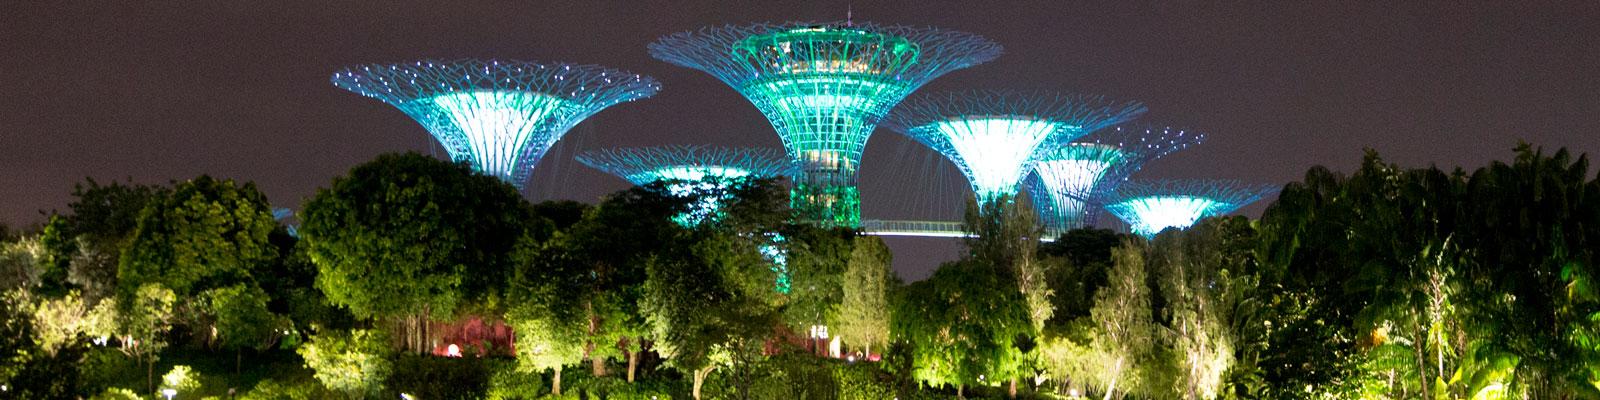 Singapore Supertree Grove